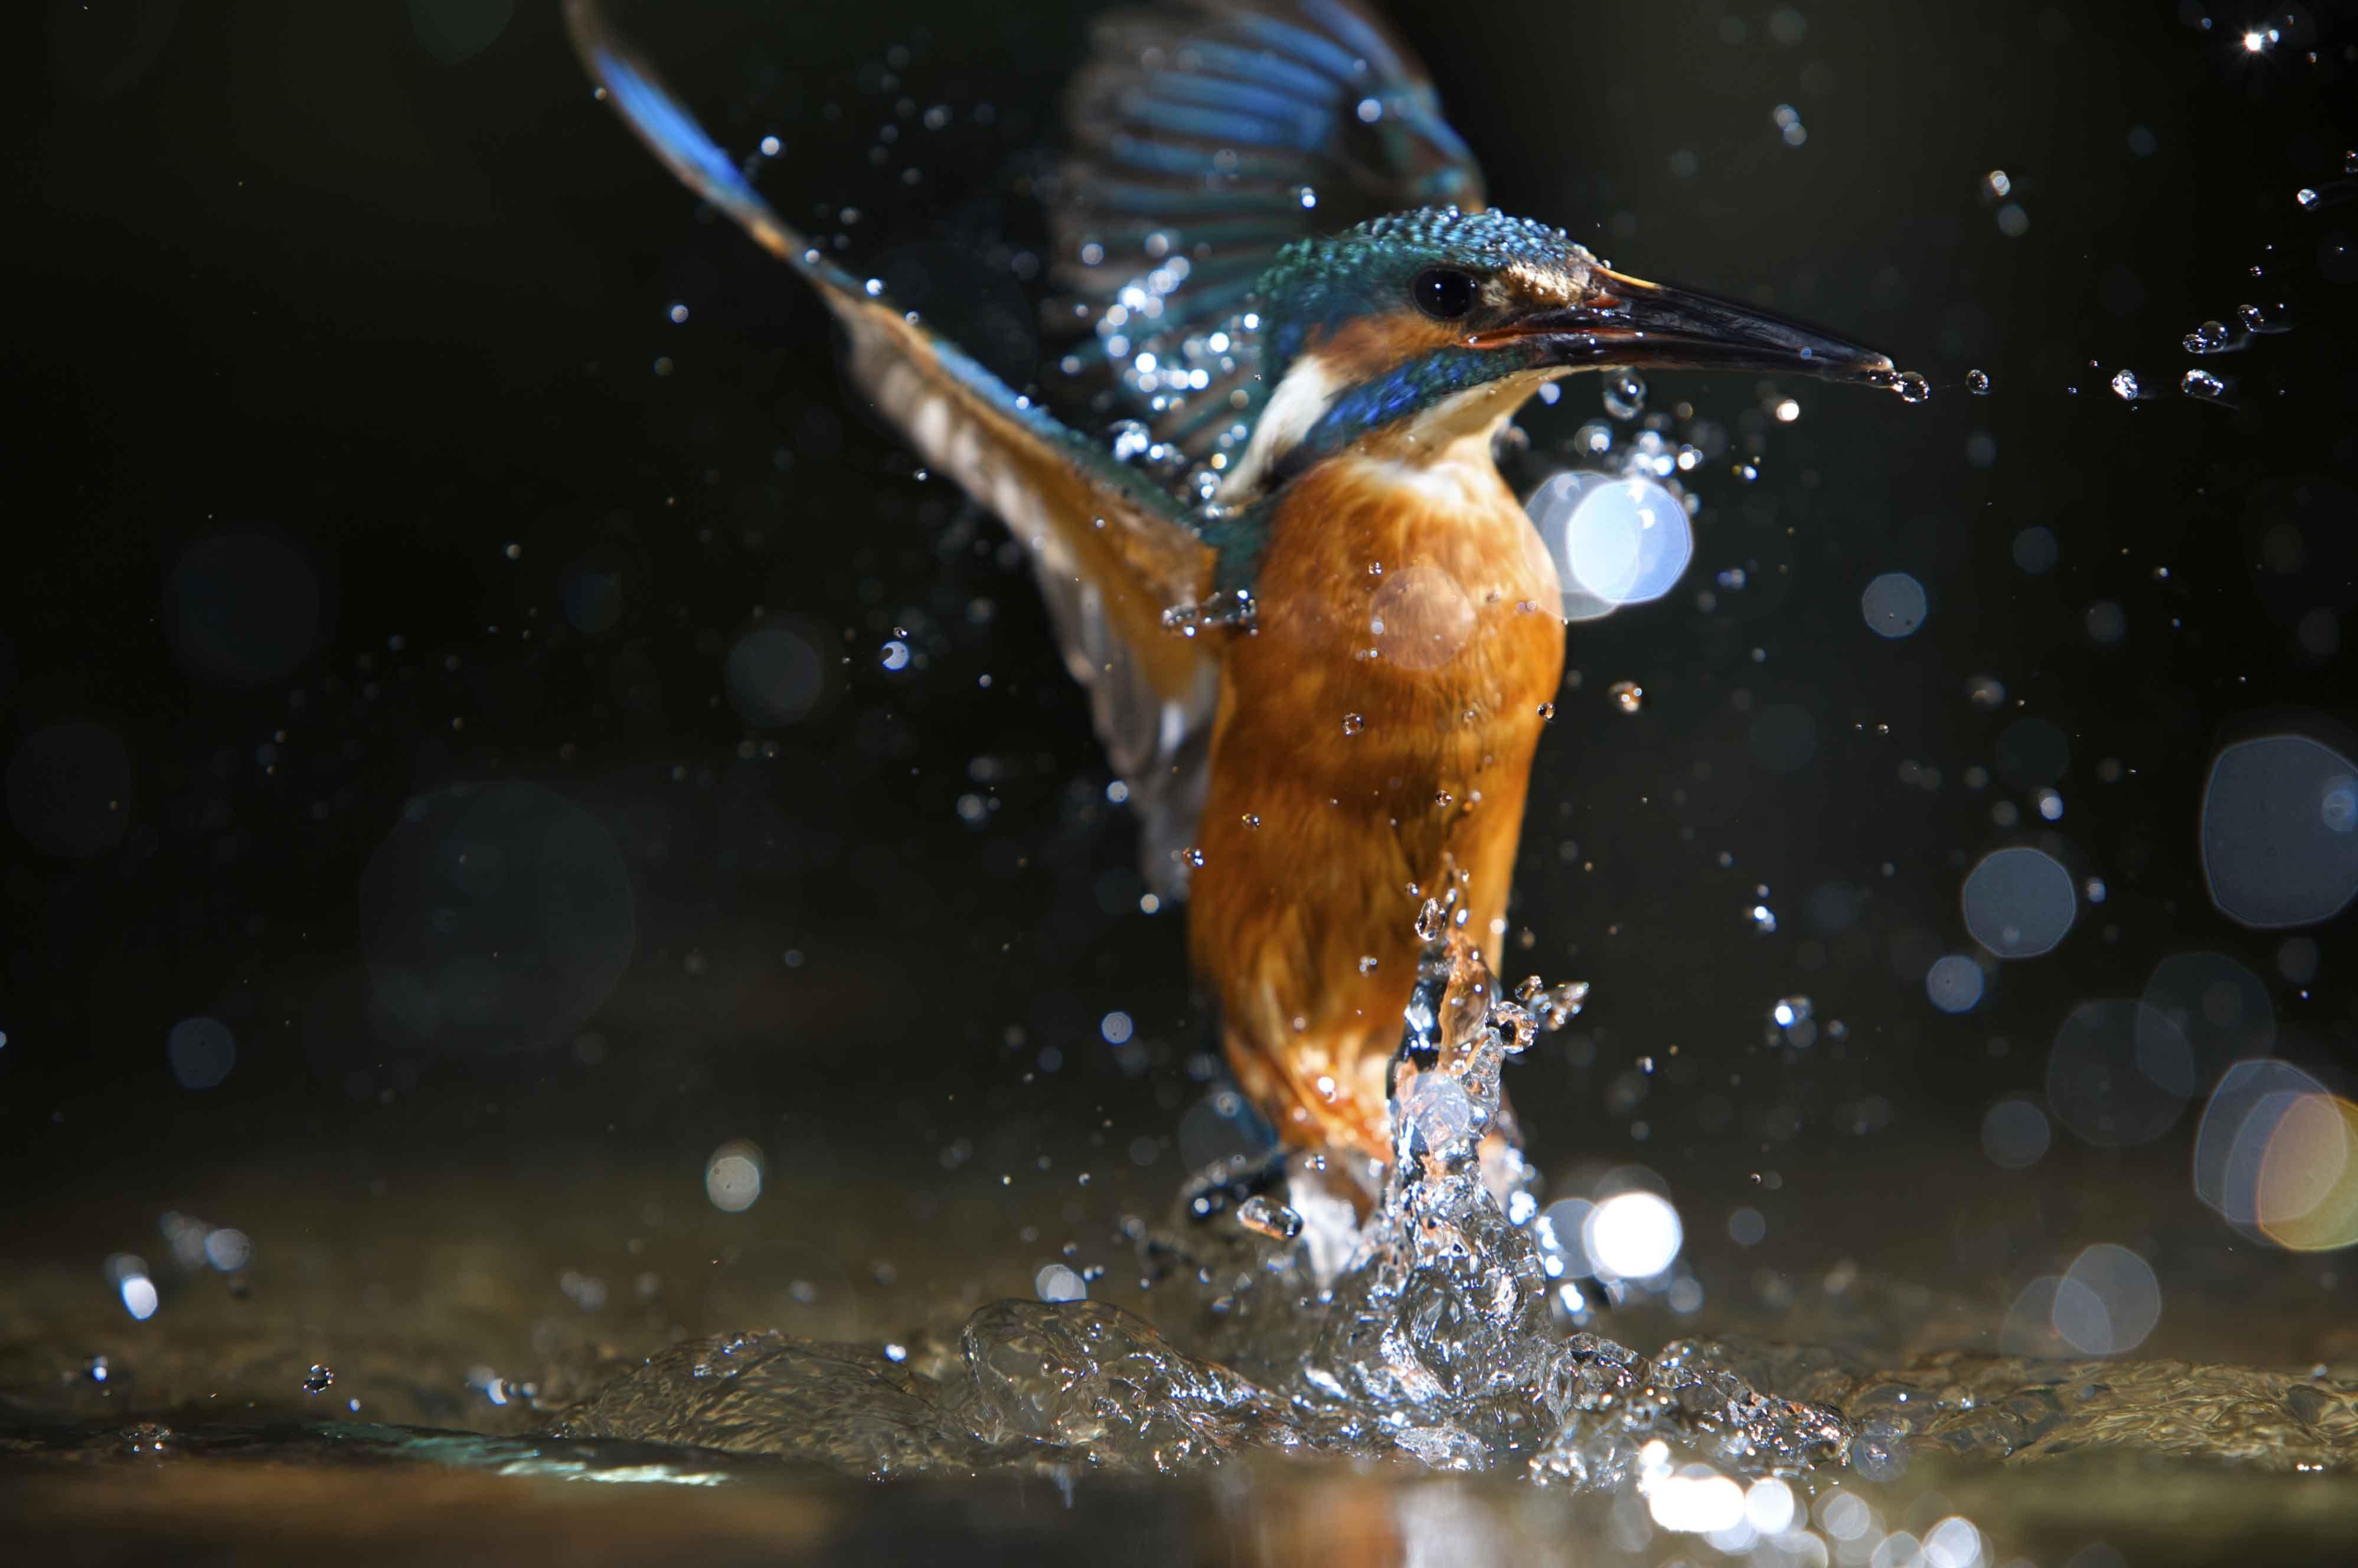 High Definition Kingfisher Bird Hd Wallpaper Common Kingfisher Kingfisher Kingfisher Bird